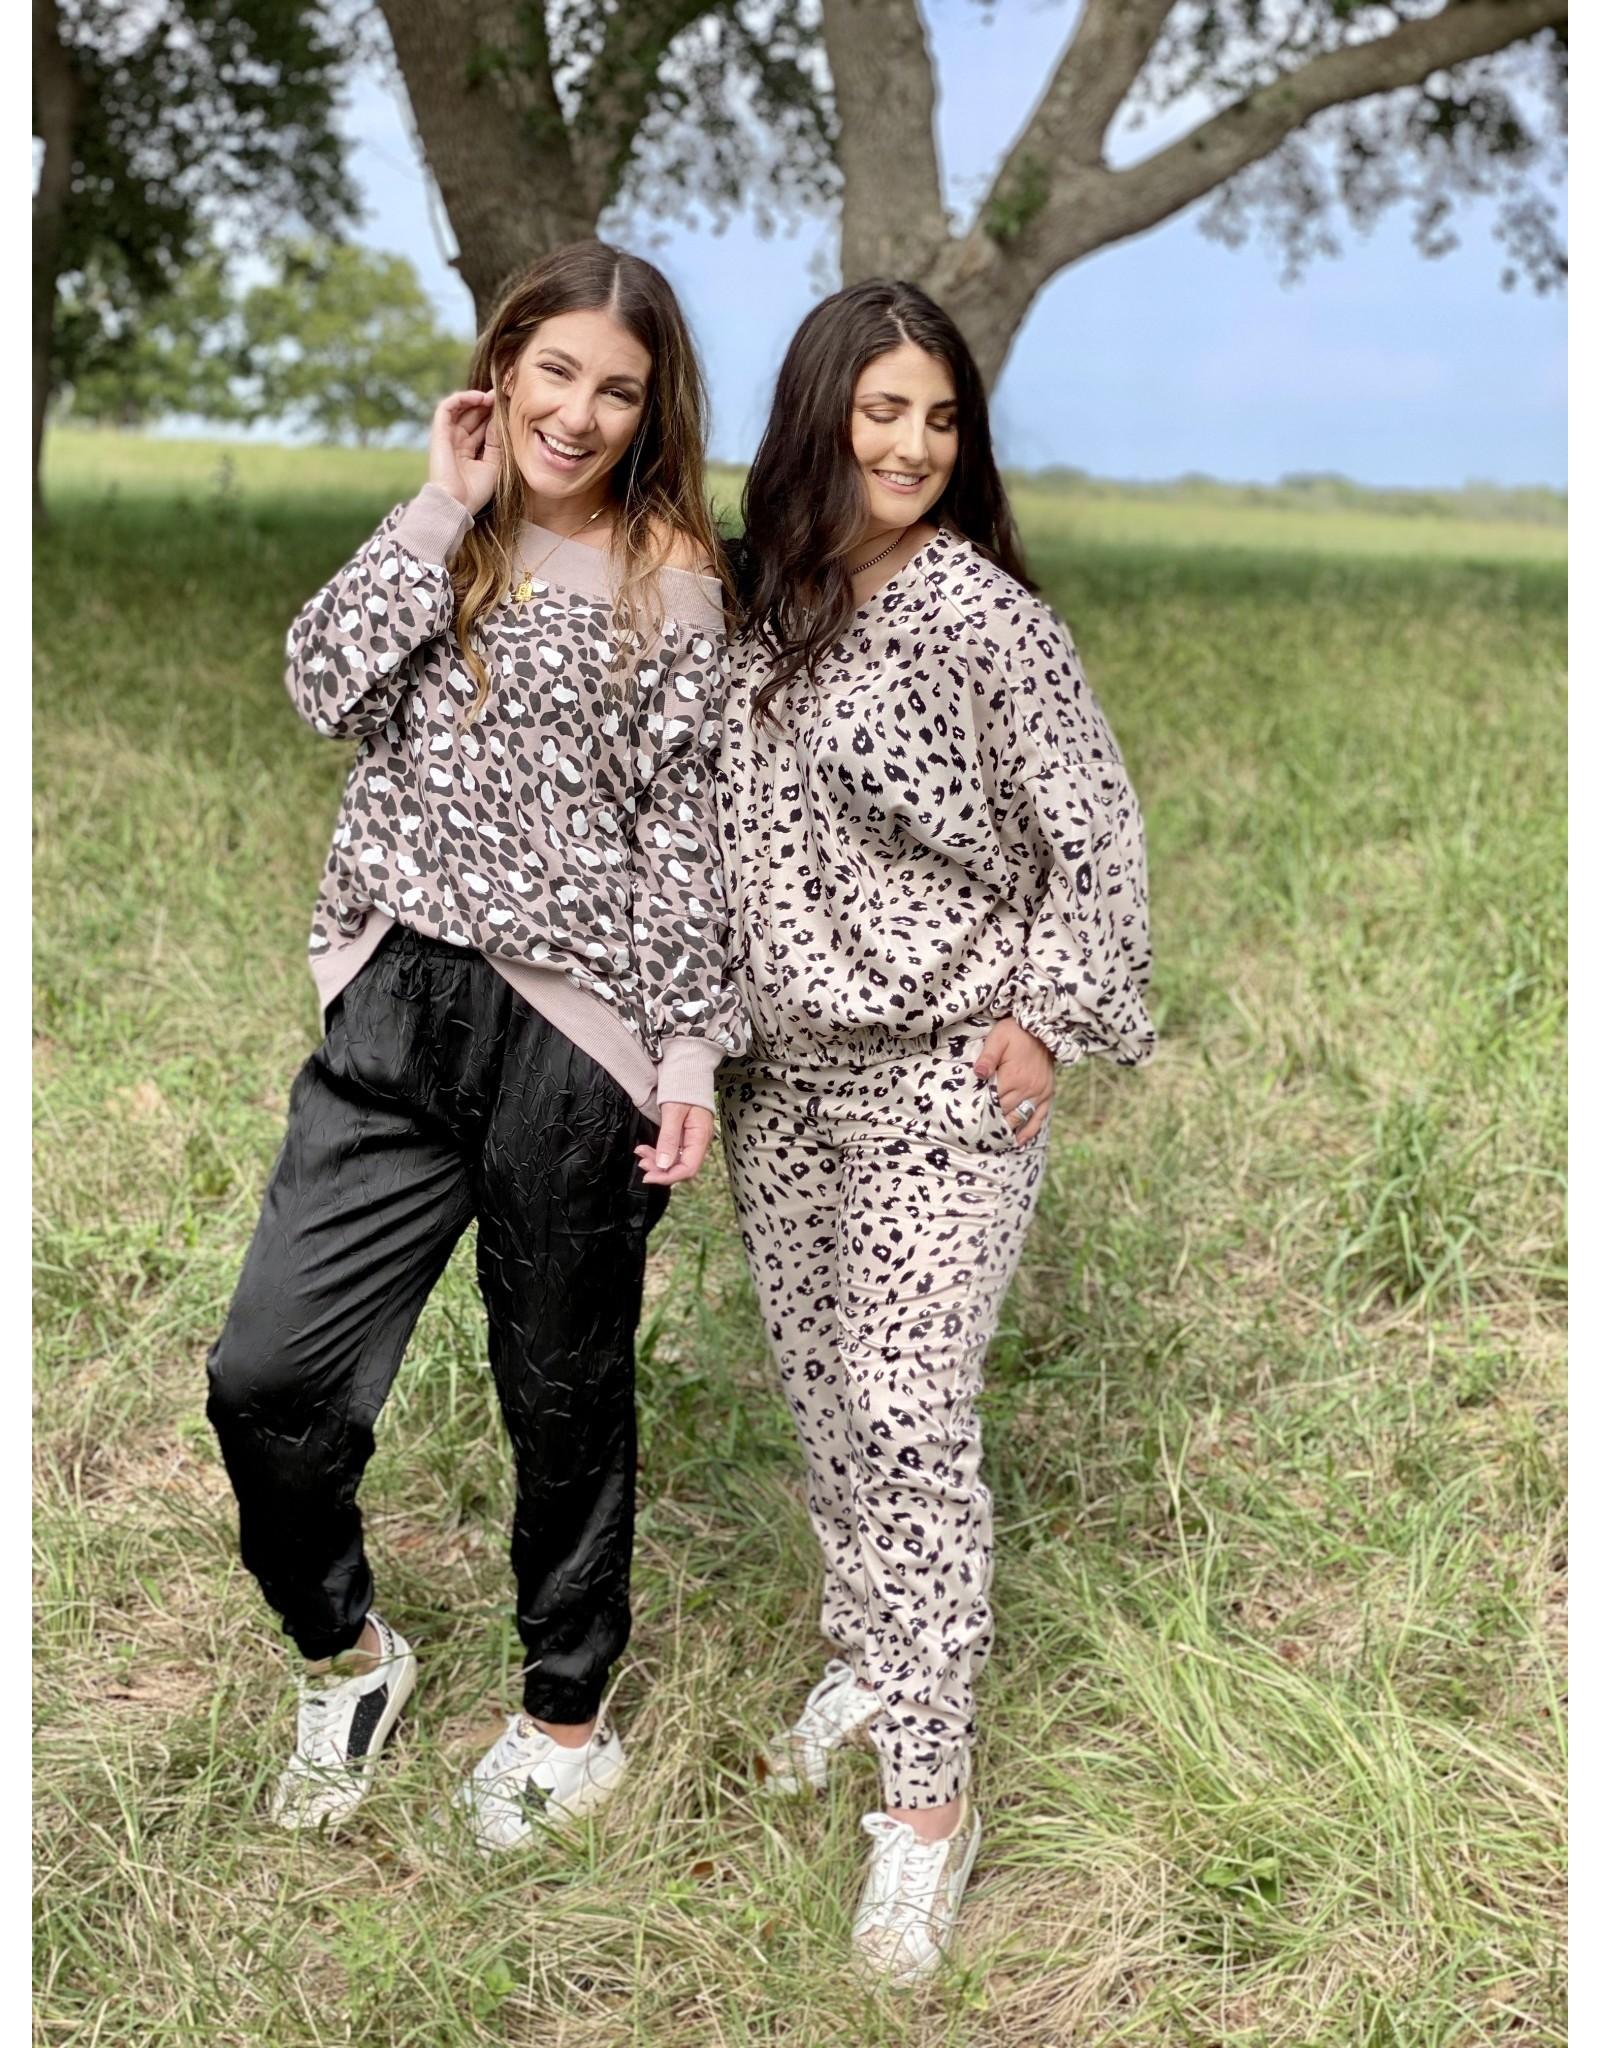 Blush Leopard Print Terry Top